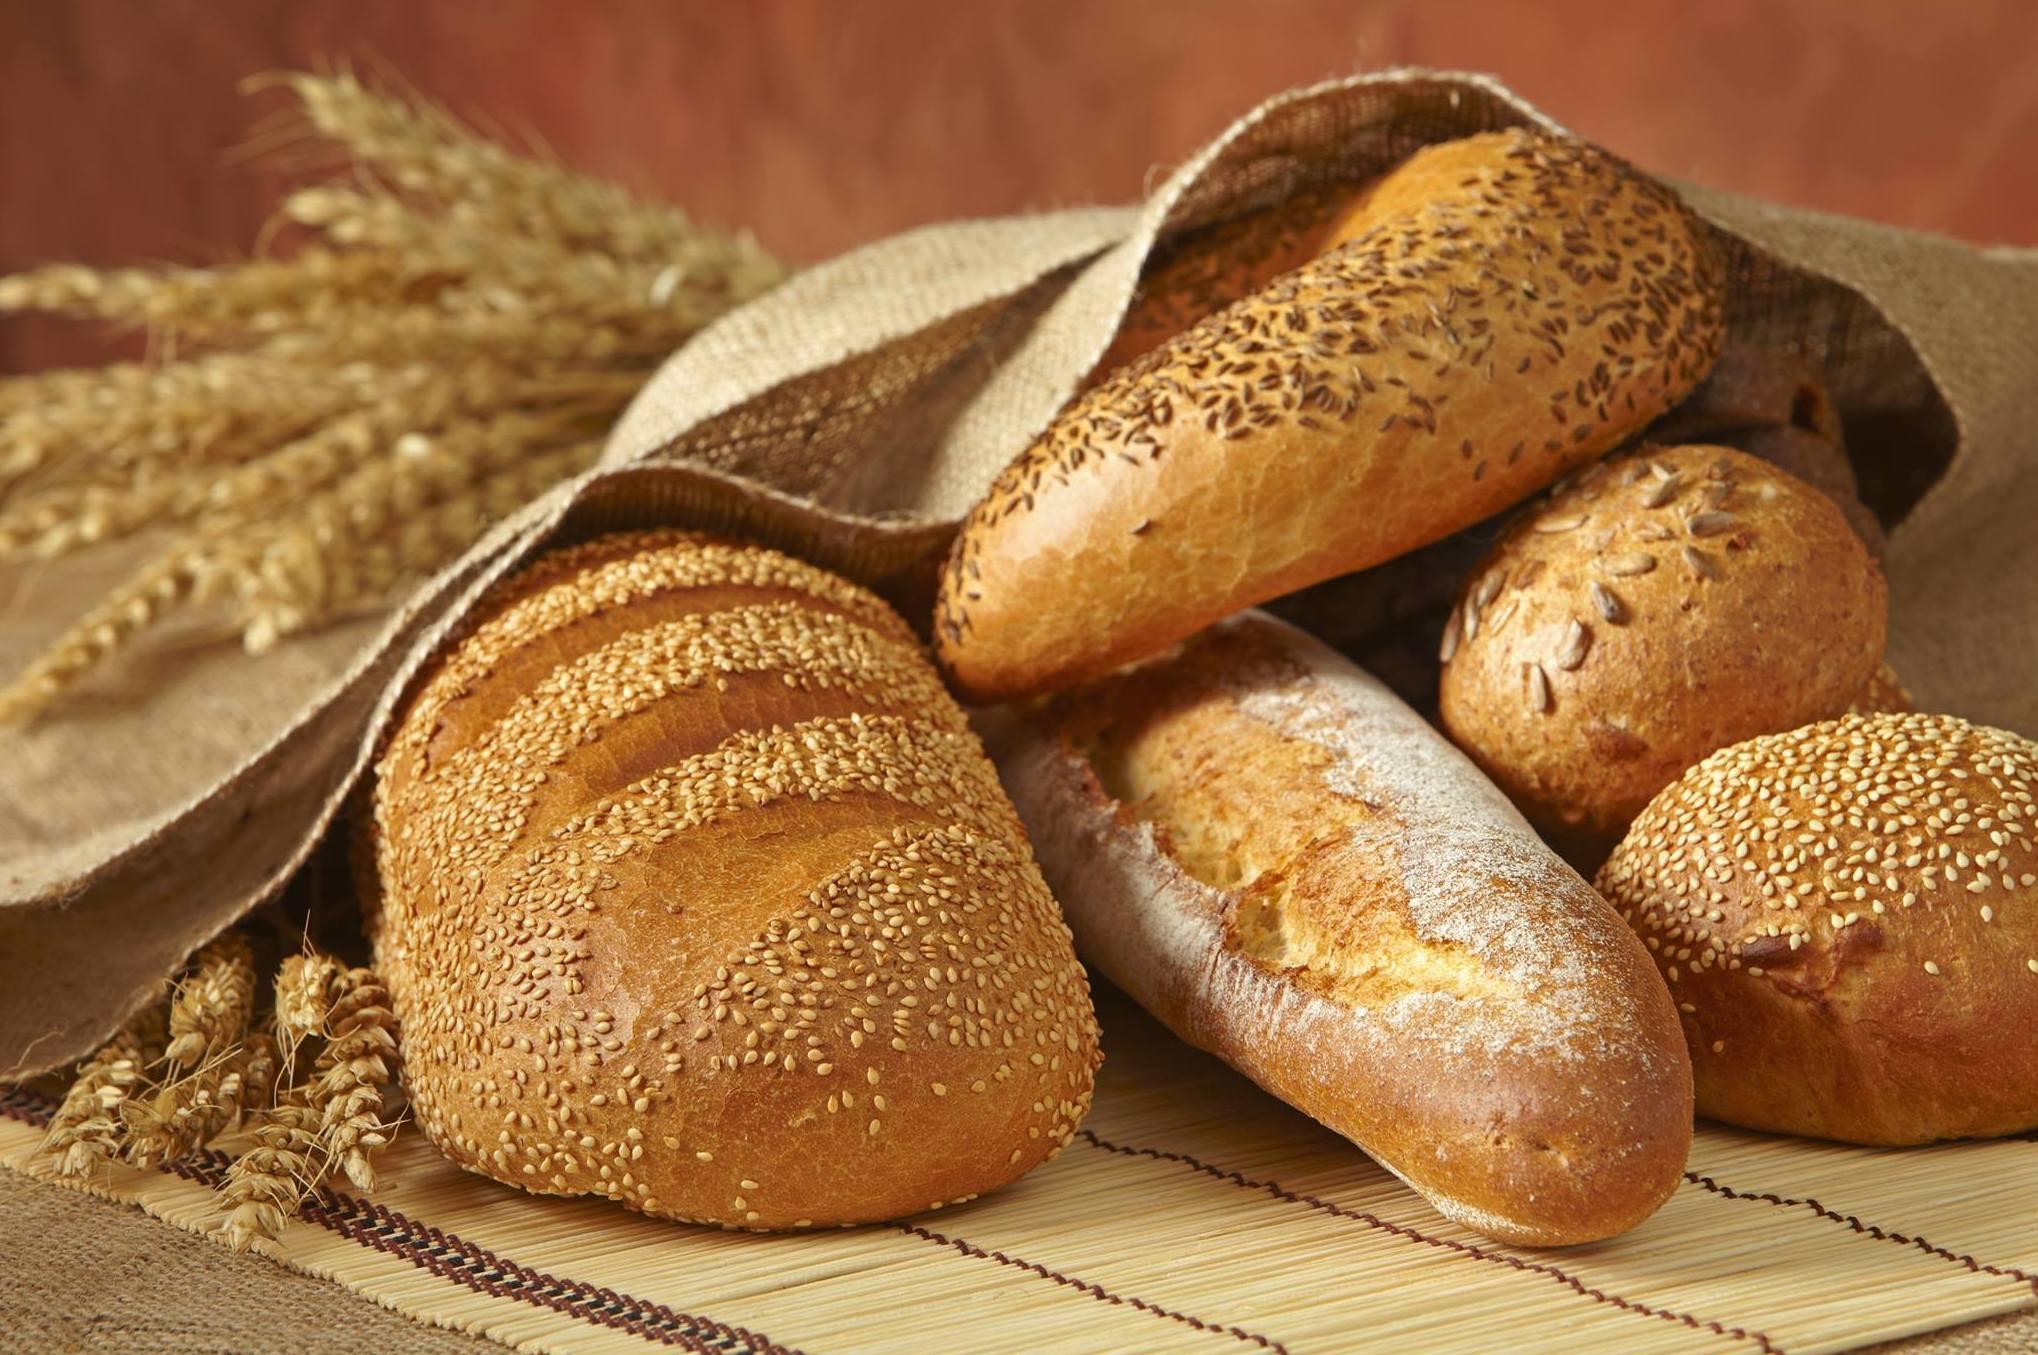 Pan artesanal: Productos de Pastelería Segado San Lorenzo